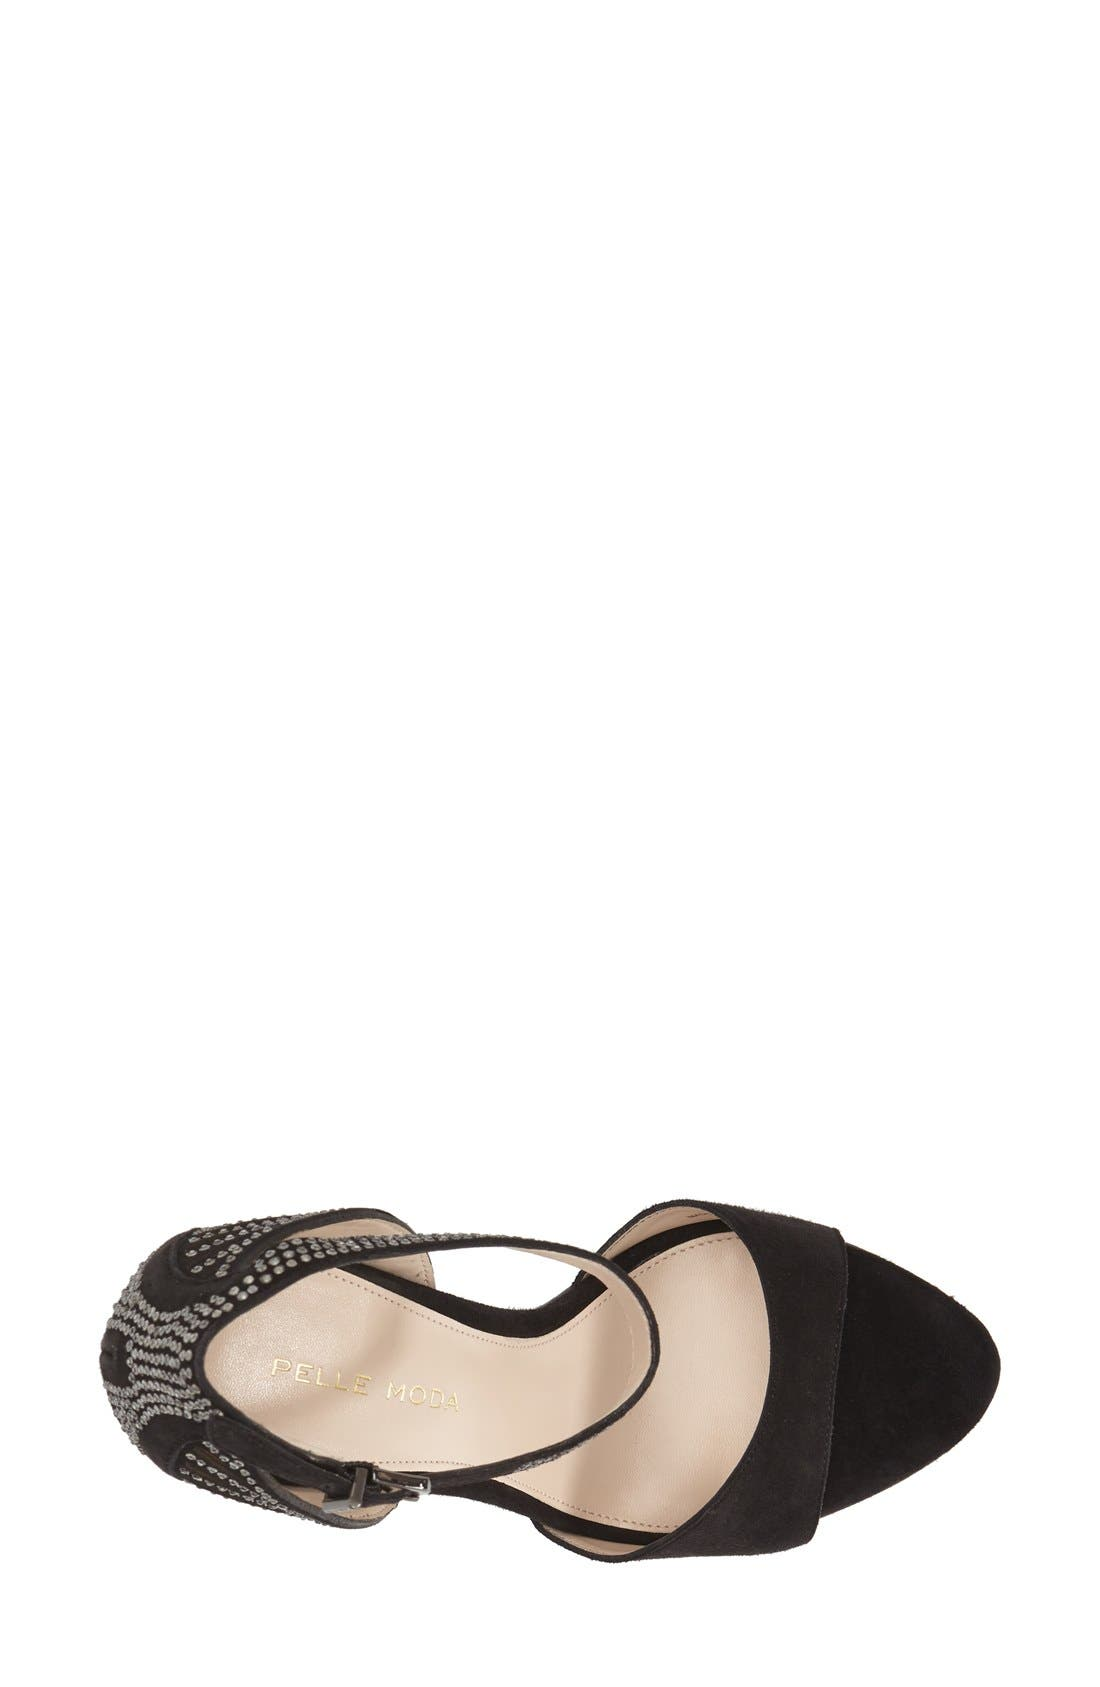 'Fenton' Ankle Strap Sandal,                             Alternate thumbnail 8, color,